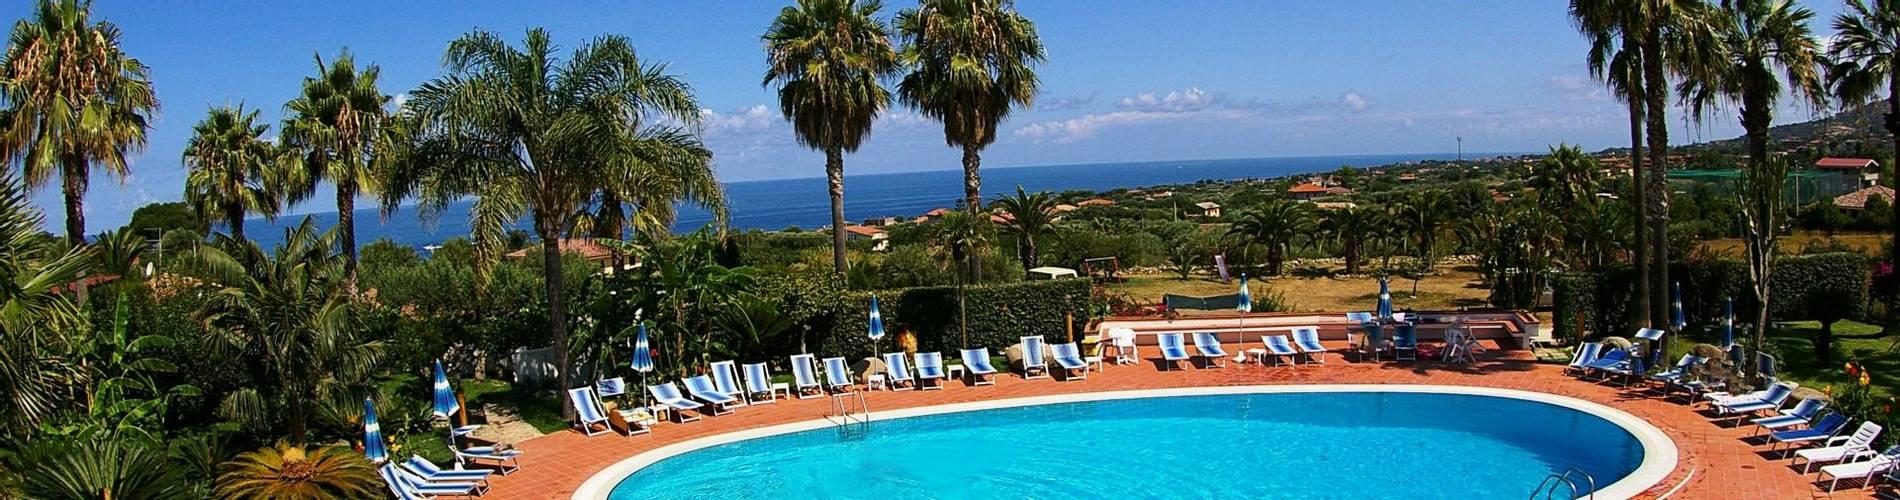 Costa Azzurra, Calabria, Italy (14).jpg